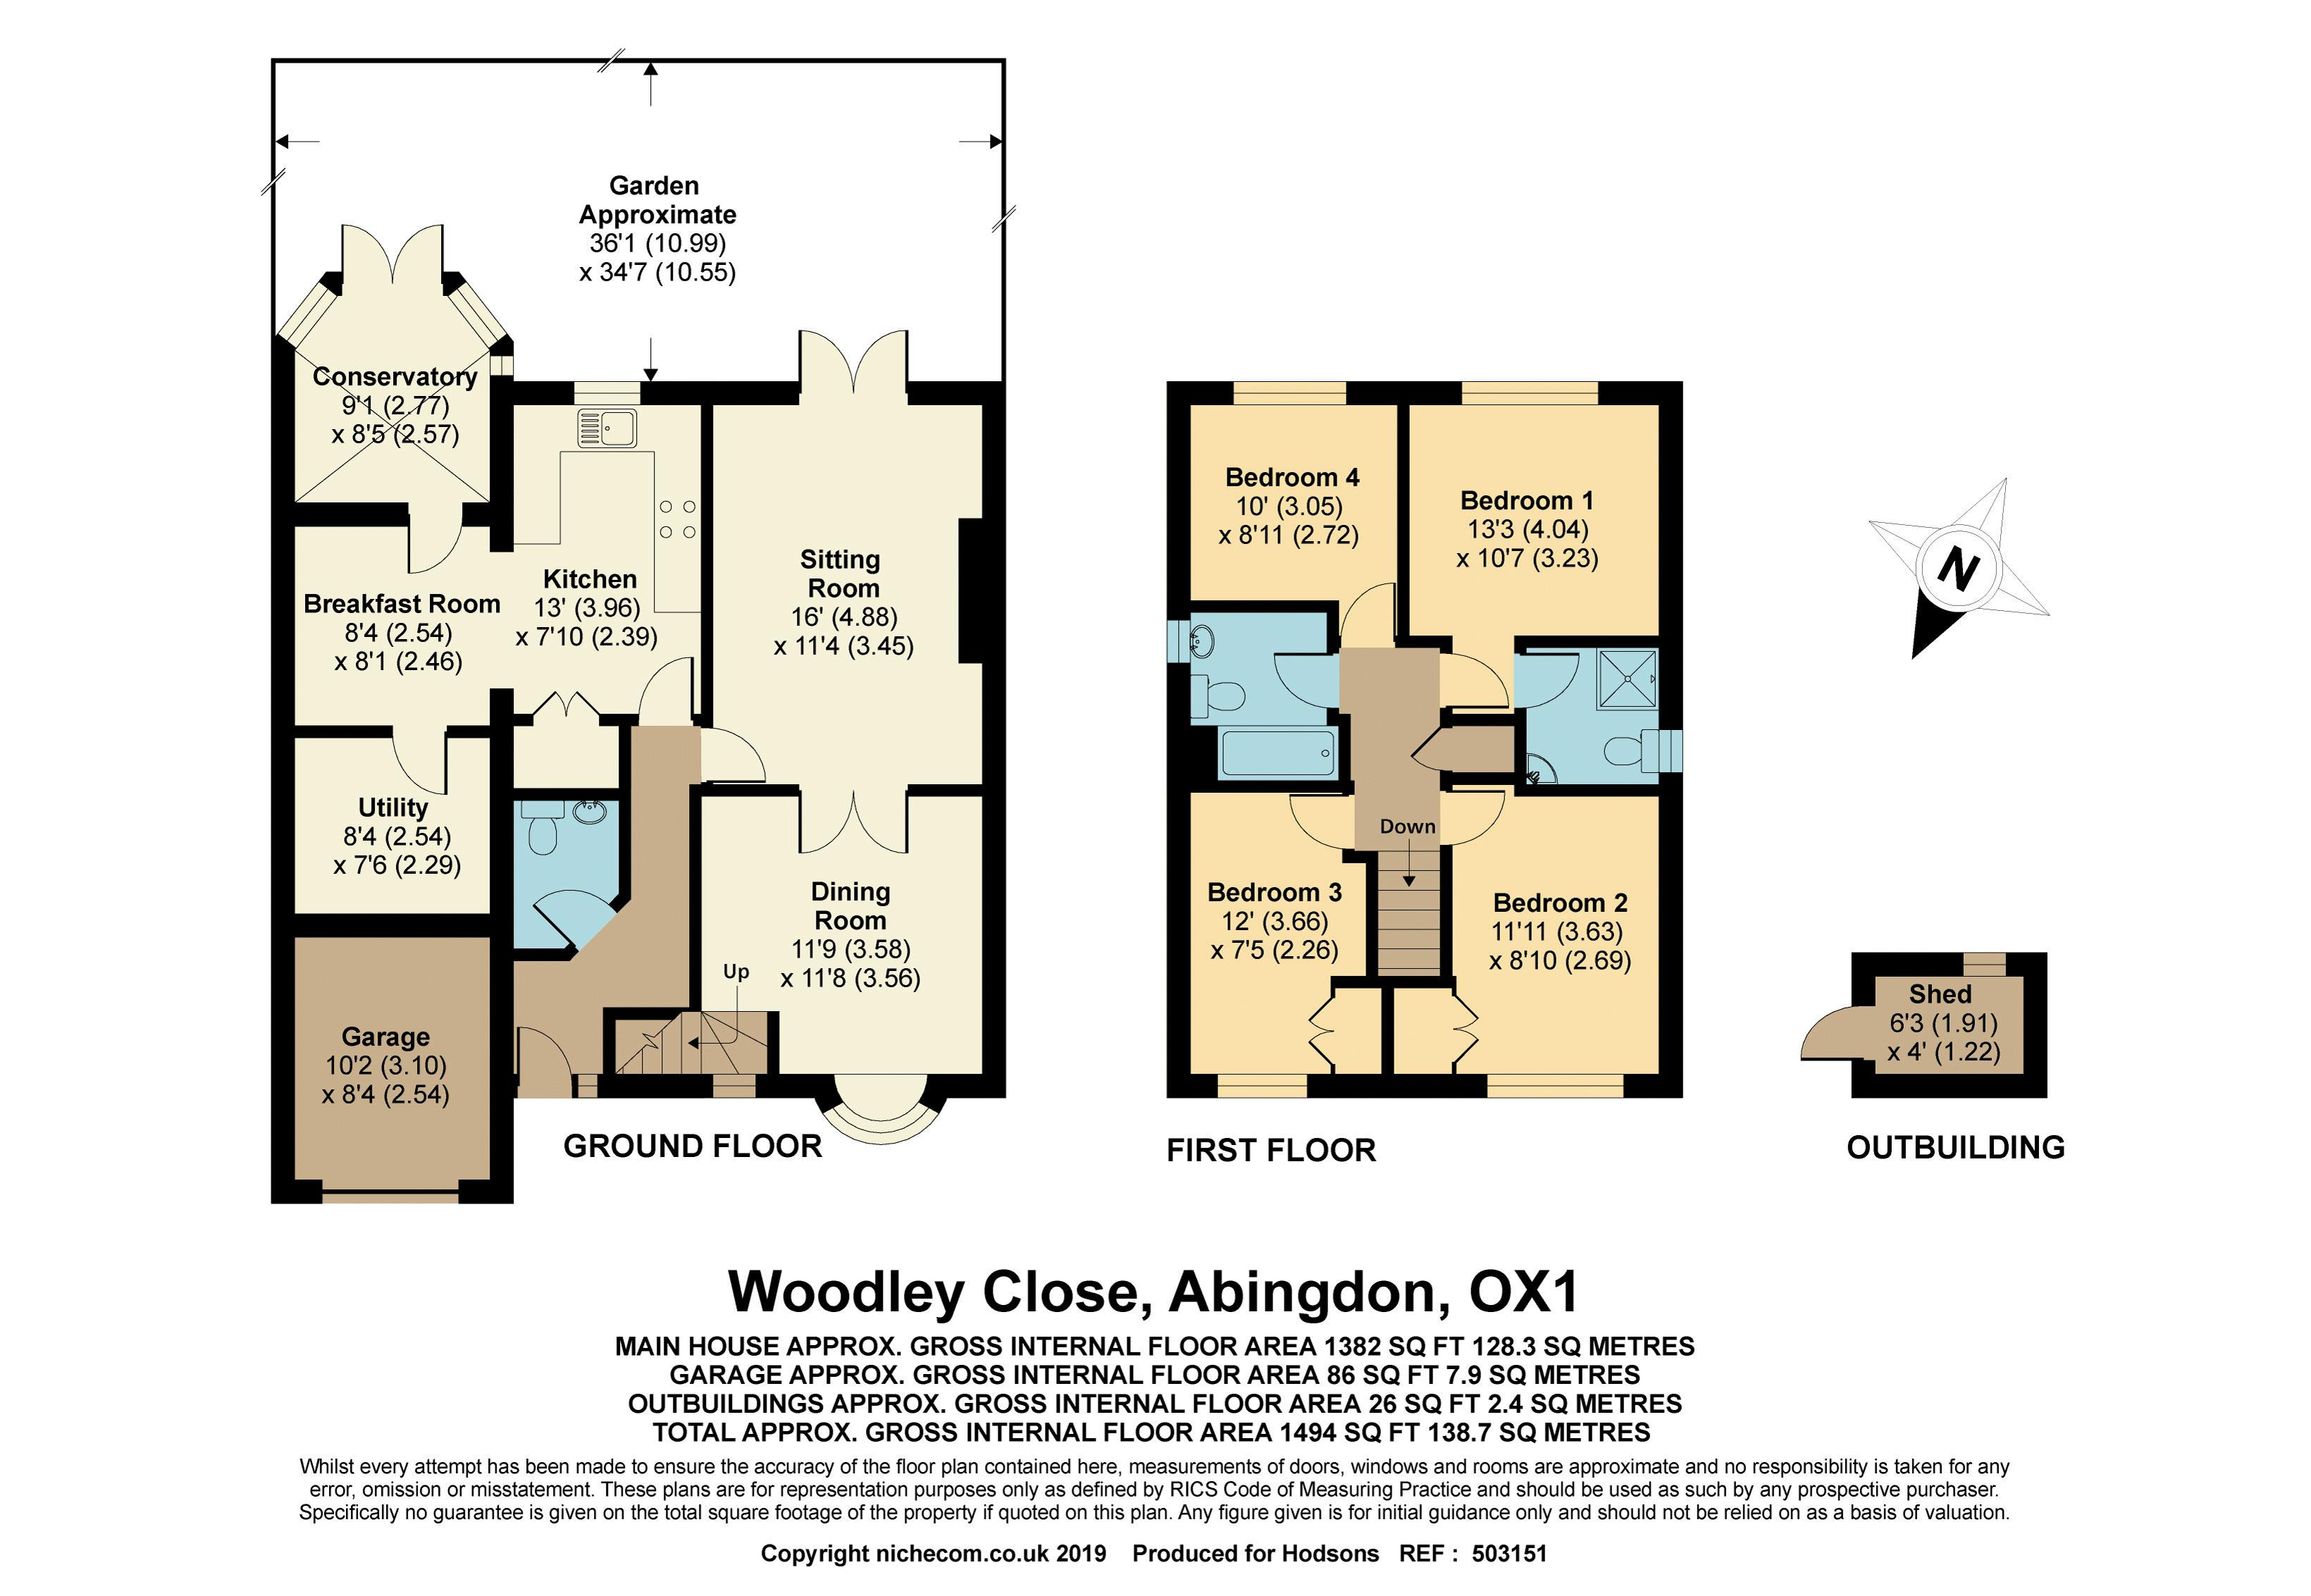 Woodley Close